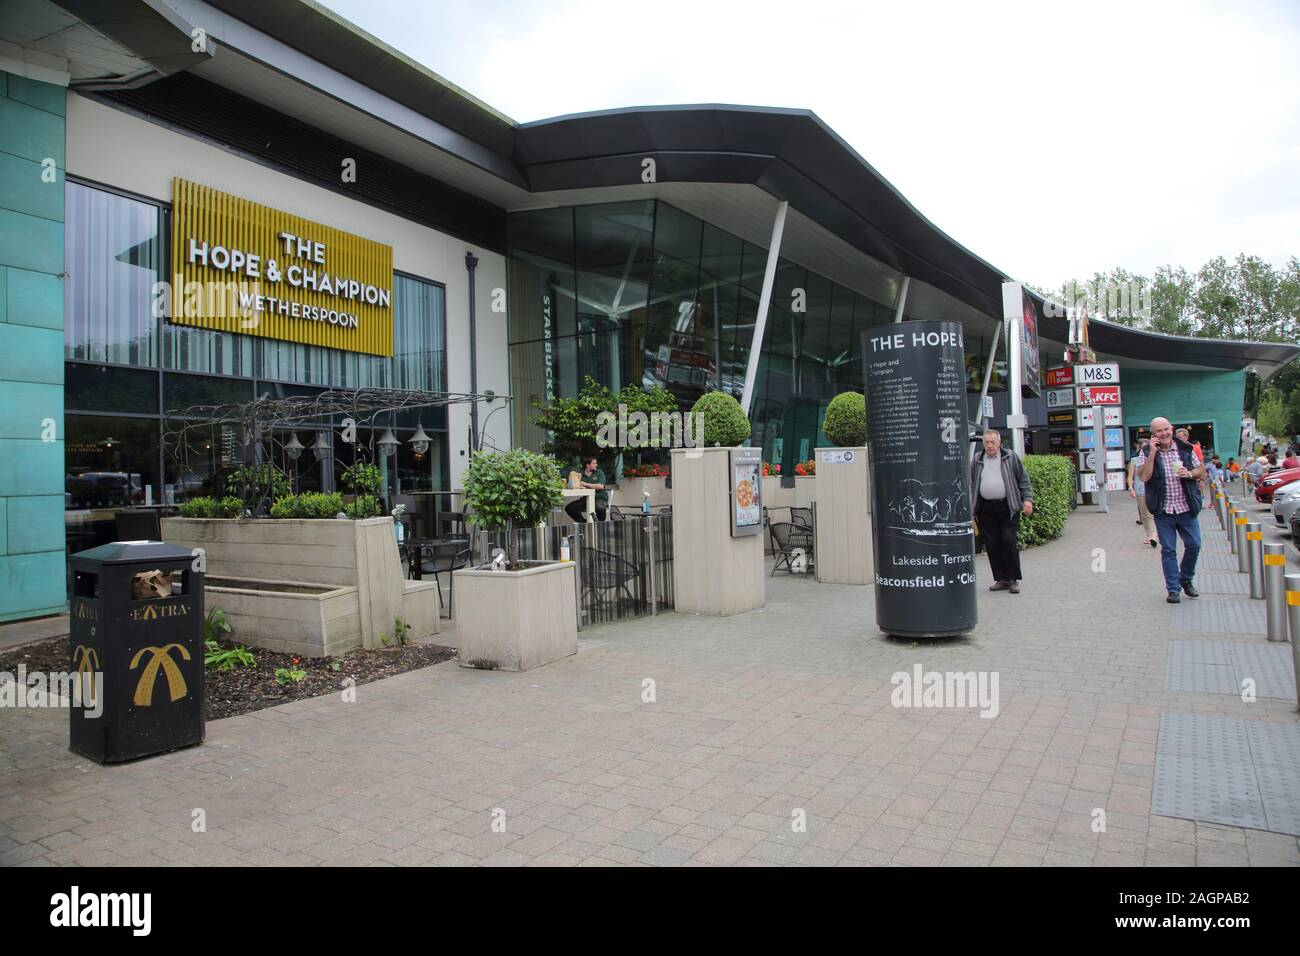 beaconsfield-service-station-on-m40-buckinghamshire-england-the-horse-and-champion-weatherspoons-pub-2AGPAB2.jpg